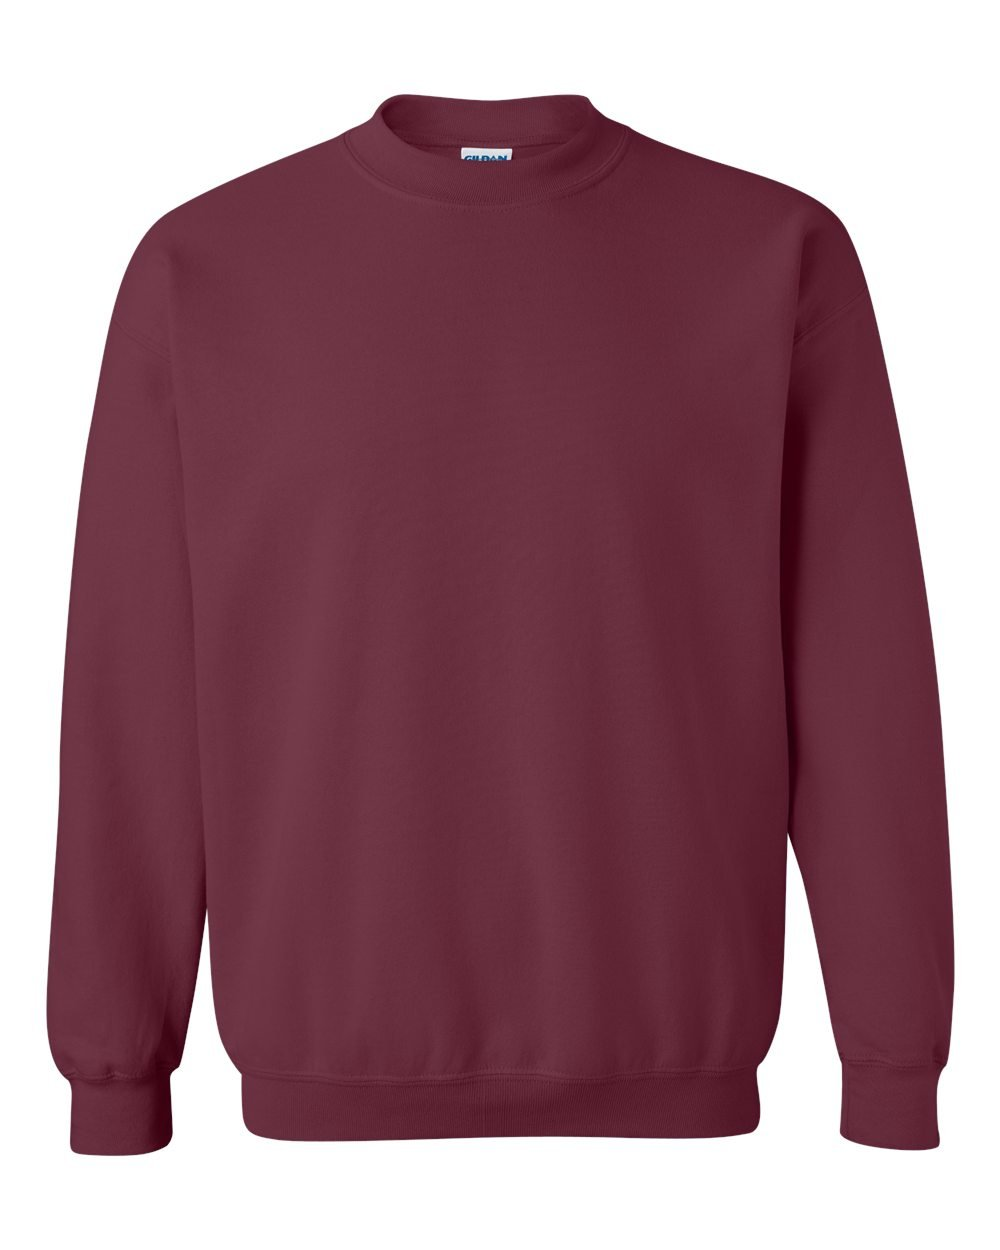 d9f58844a591 Best Rated in Men s Sweatshirts   Helpful Customer Reviews - Amazon.com